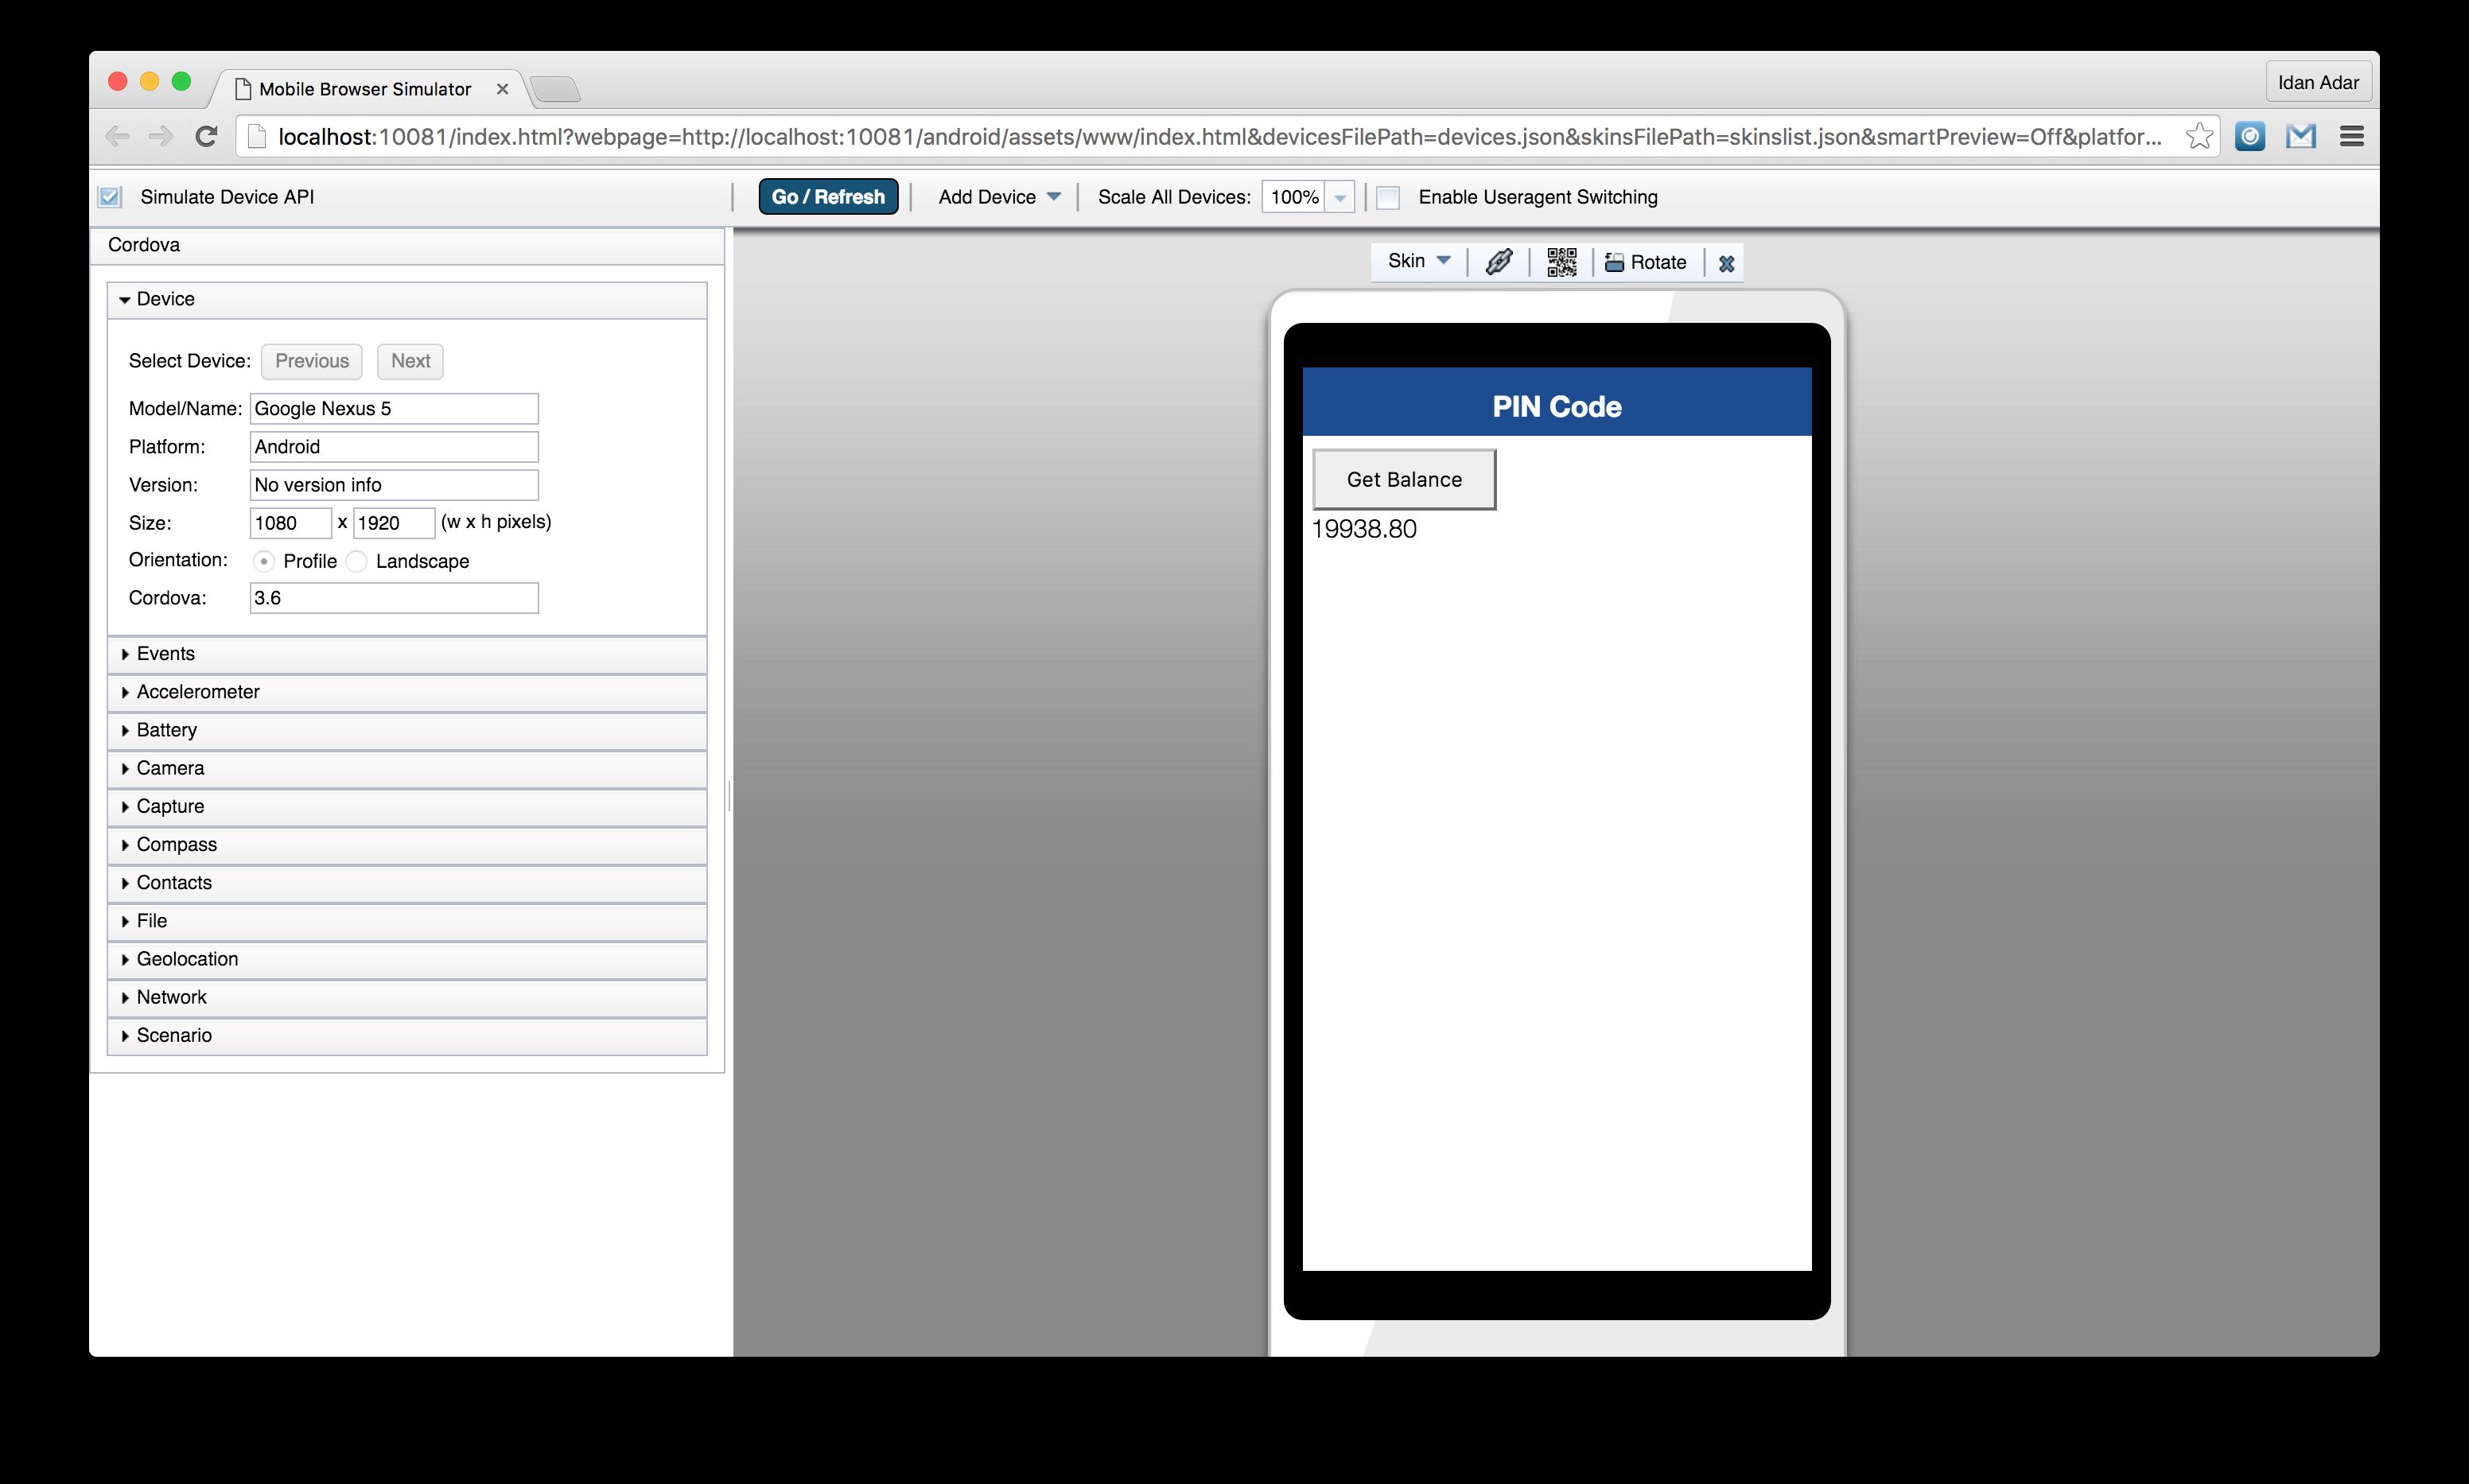 Debugging JavaScript (Cordova, Web) Applications - IBM Mobile